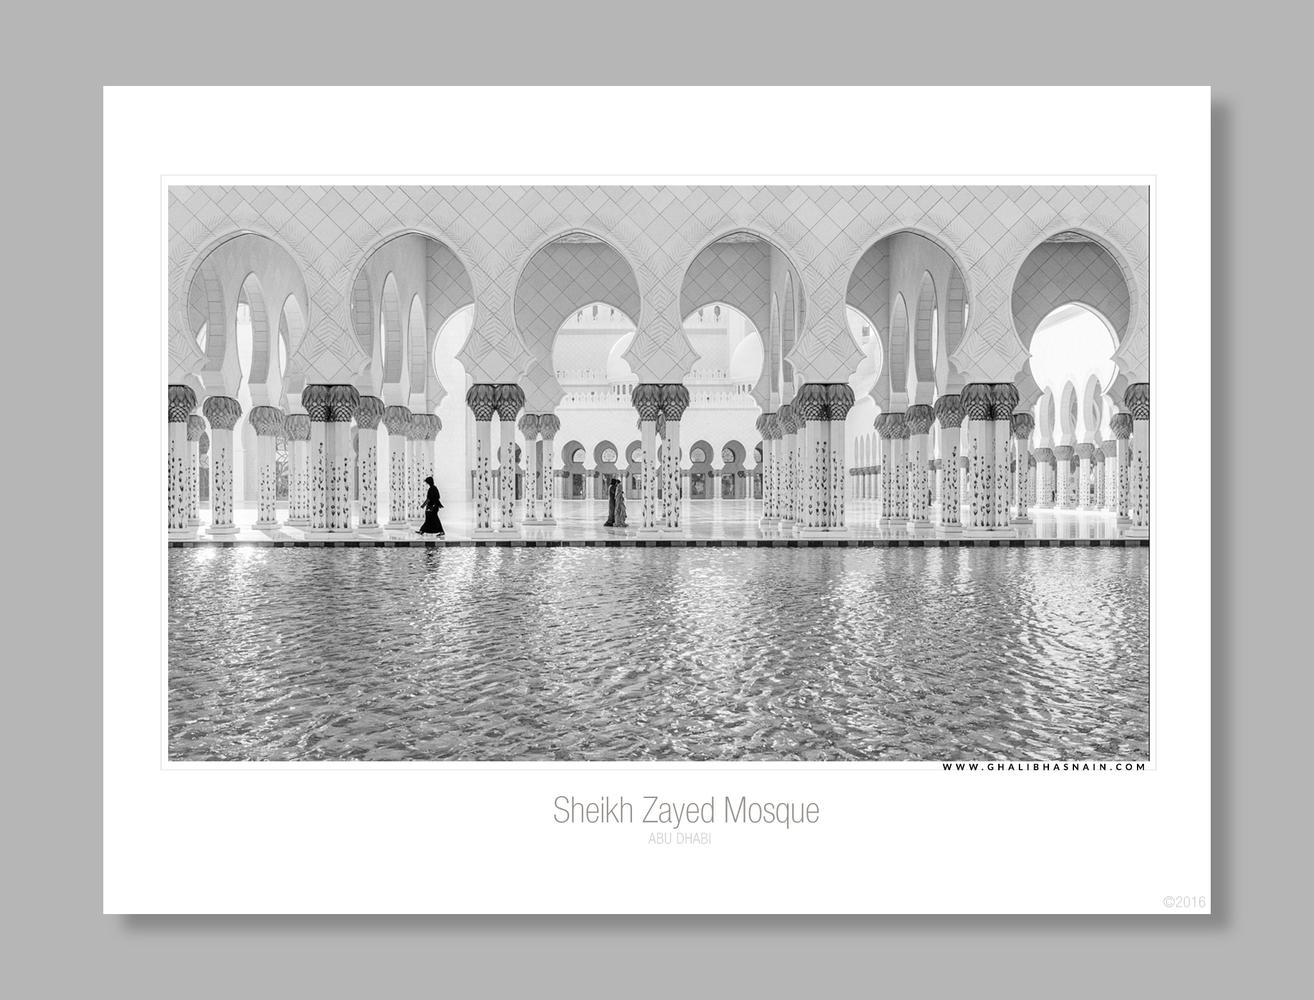 Sheikh Zayed Grand Mosque  by Ghalib Hasnain